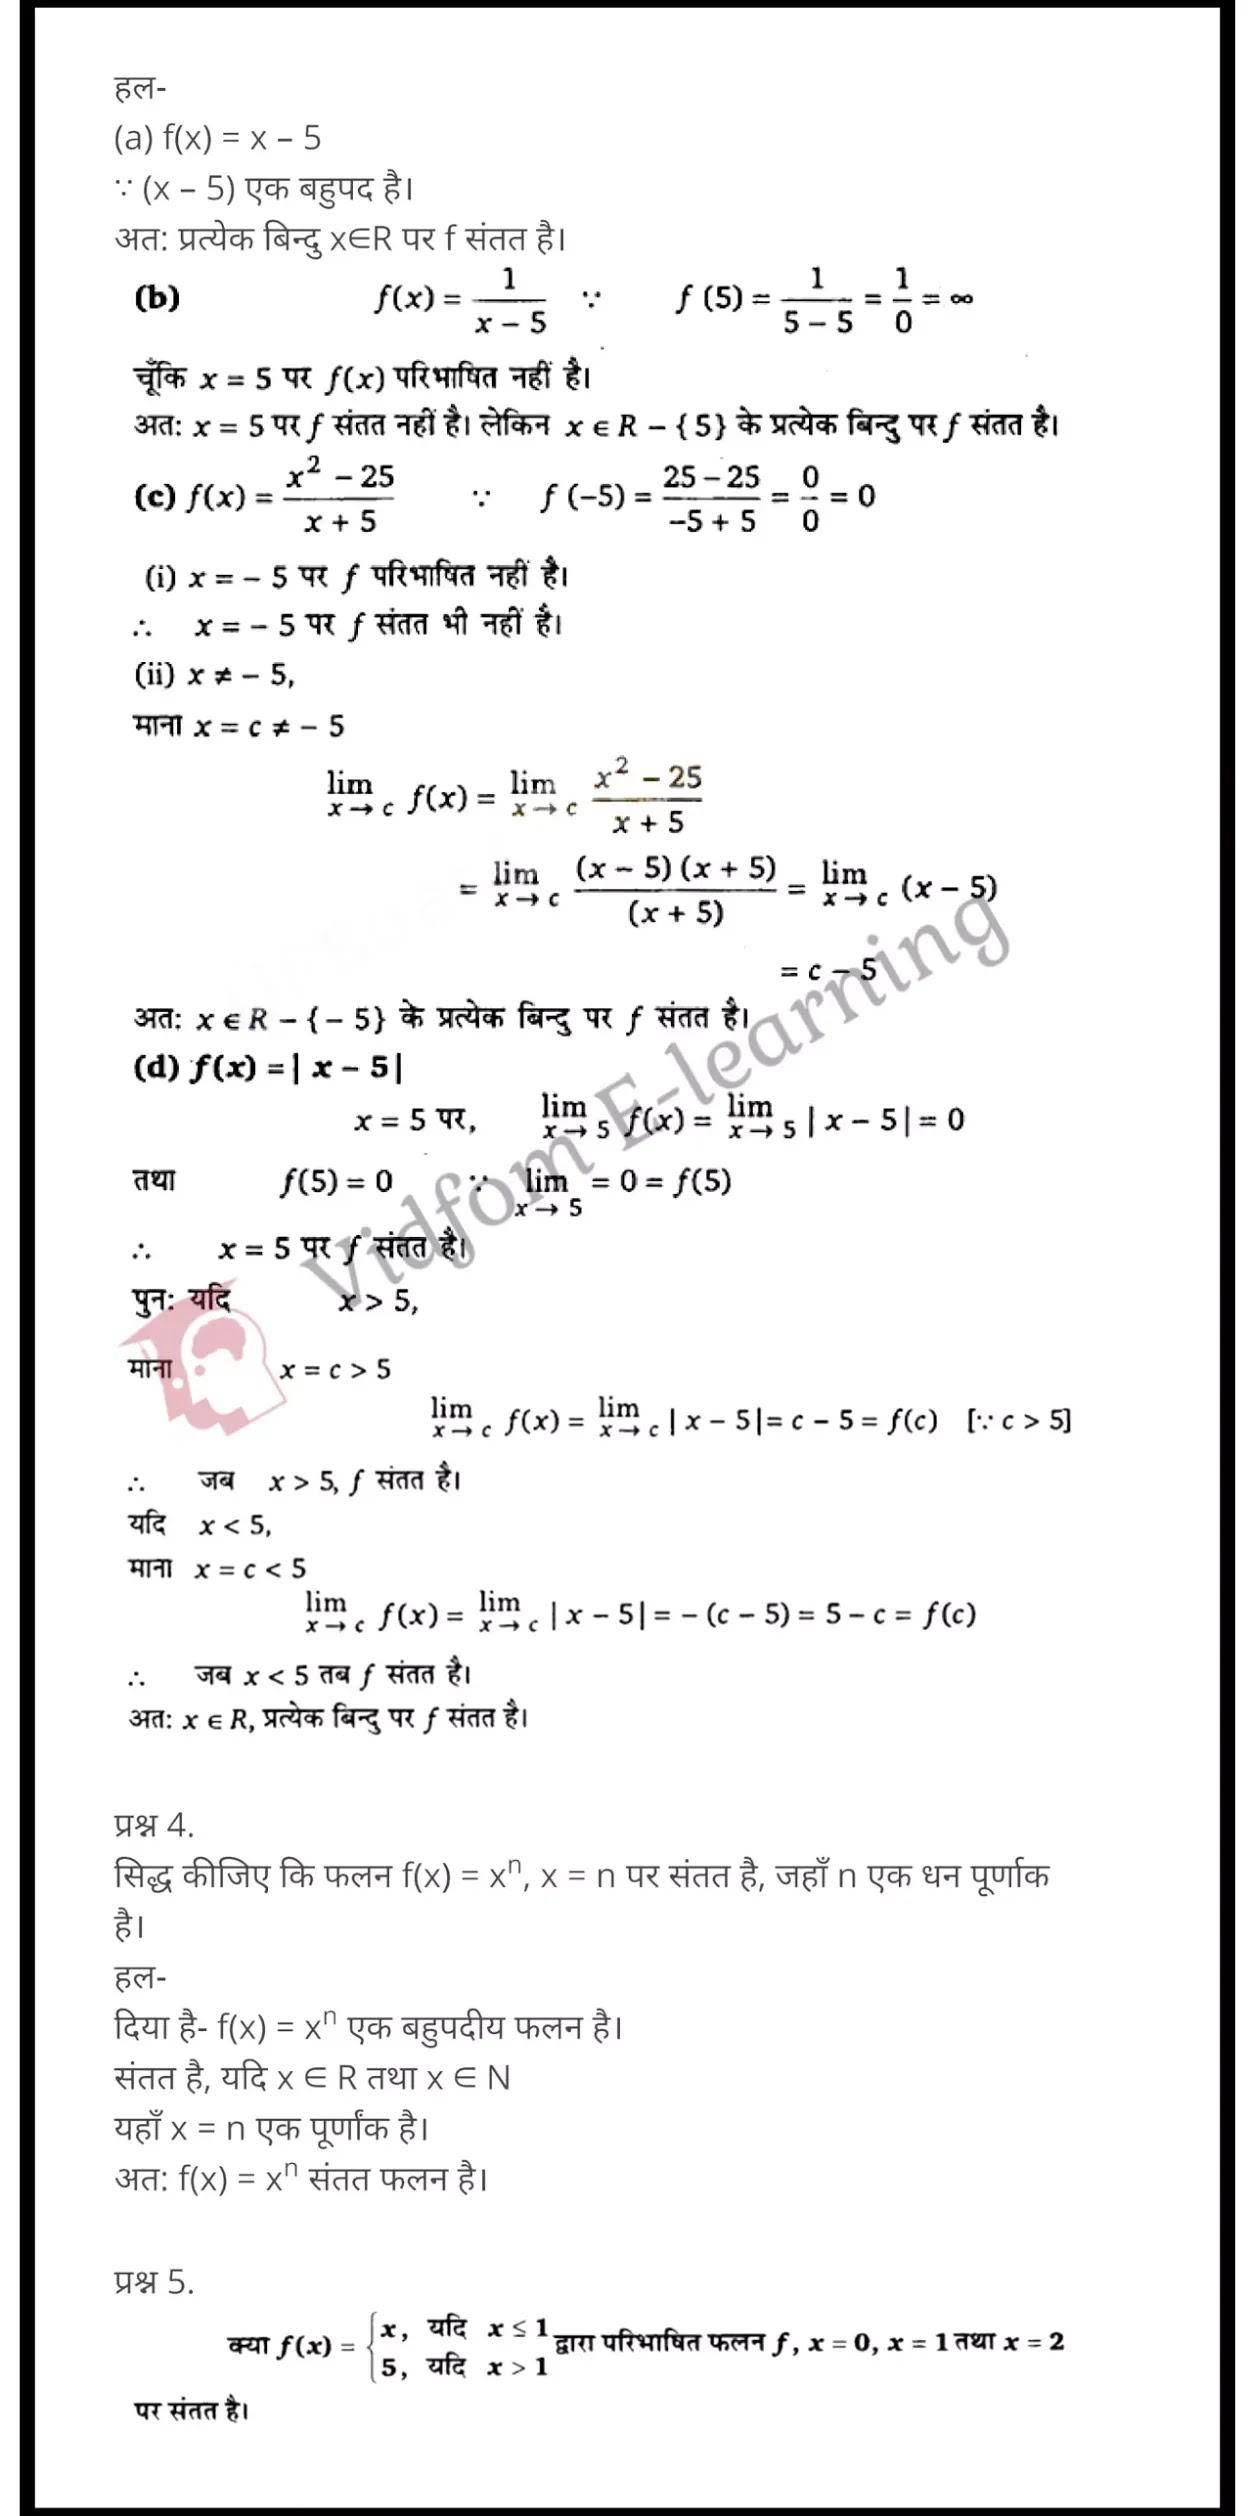 कक्षा 12 गणित  के नोट्स  हिंदी में एनसीईआरटी समाधान,     class 12 Maths Chapter 5,   class 12 Maths Chapter 5 ncert solutions in Hindi,   class 12 Maths Chapter 5 notes in hindi,   class 12 Maths Chapter 5 question answer,   class 12 Maths Chapter 5 notes,   class 12 Maths Chapter 5 class 12 Maths Chapter 5 in  hindi,    class 12 Maths Chapter 5 important questions in  hindi,   class 12 Maths Chapter 5 notes in hindi,    class 12 Maths Chapter 5 test,   class 12 Maths Chapter 5 pdf,   class 12 Maths Chapter 5 notes pdf,   class 12 Maths Chapter 5 exercise solutions,   class 12 Maths Chapter 5 notes study rankers,   class 12 Maths Chapter 5 notes,    class 12 Maths Chapter 5  class 12  notes pdf,   class 12 Maths Chapter 5 class 12  notes  ncert,   class 12 Maths Chapter 5 class 12 pdf,   class 12 Maths Chapter 5  book,   class 12 Maths Chapter 5 quiz class 12  ,    10  th class 12 Maths Chapter 5  book up board,   up board 10  th class 12 Maths Chapter 5 notes,  class 12 Maths,   class 12 Maths ncert solutions in Hindi,   class 12 Maths notes in hindi,   class 12 Maths question answer,   class 12 Maths notes,  class 12 Maths class 12 Maths Chapter 5 in  hindi,    class 12 Maths important questions in  hindi,   class 12 Maths notes in hindi,    class 12 Maths test,  class 12 Maths class 12 Maths Chapter 5 pdf,   class 12 Maths notes pdf,   class 12 Maths exercise solutions,   class 12 Maths,  class 12 Maths notes study rankers,   class 12 Maths notes,  class 12 Maths notes,   class 12 Maths  class 12  notes pdf,   class 12 Maths class 12  notes  ncert,   class 12 Maths class 12 pdf,   class 12 Maths  book,  class 12 Maths quiz class 12  ,  10  th class 12 Maths    book up board,    up board 10  th class 12 Maths notes,      कक्षा 12 गणित अध्याय 5 ,  कक्षा 12 गणित, कक्षा 12 गणित अध्याय 5  के नोट्स हिंदी में,  कक्षा 12 का हिंदी अध्याय 5 का प्रश्न उत्तर,  कक्षा 12 गणित अध्याय 5 के नोट्स,  10 कक्षा गणित  हिंदी में, कक्षा 12 गणित अध्याय 5  हिंदी में,  कक्षा 12 गणित अध्याय